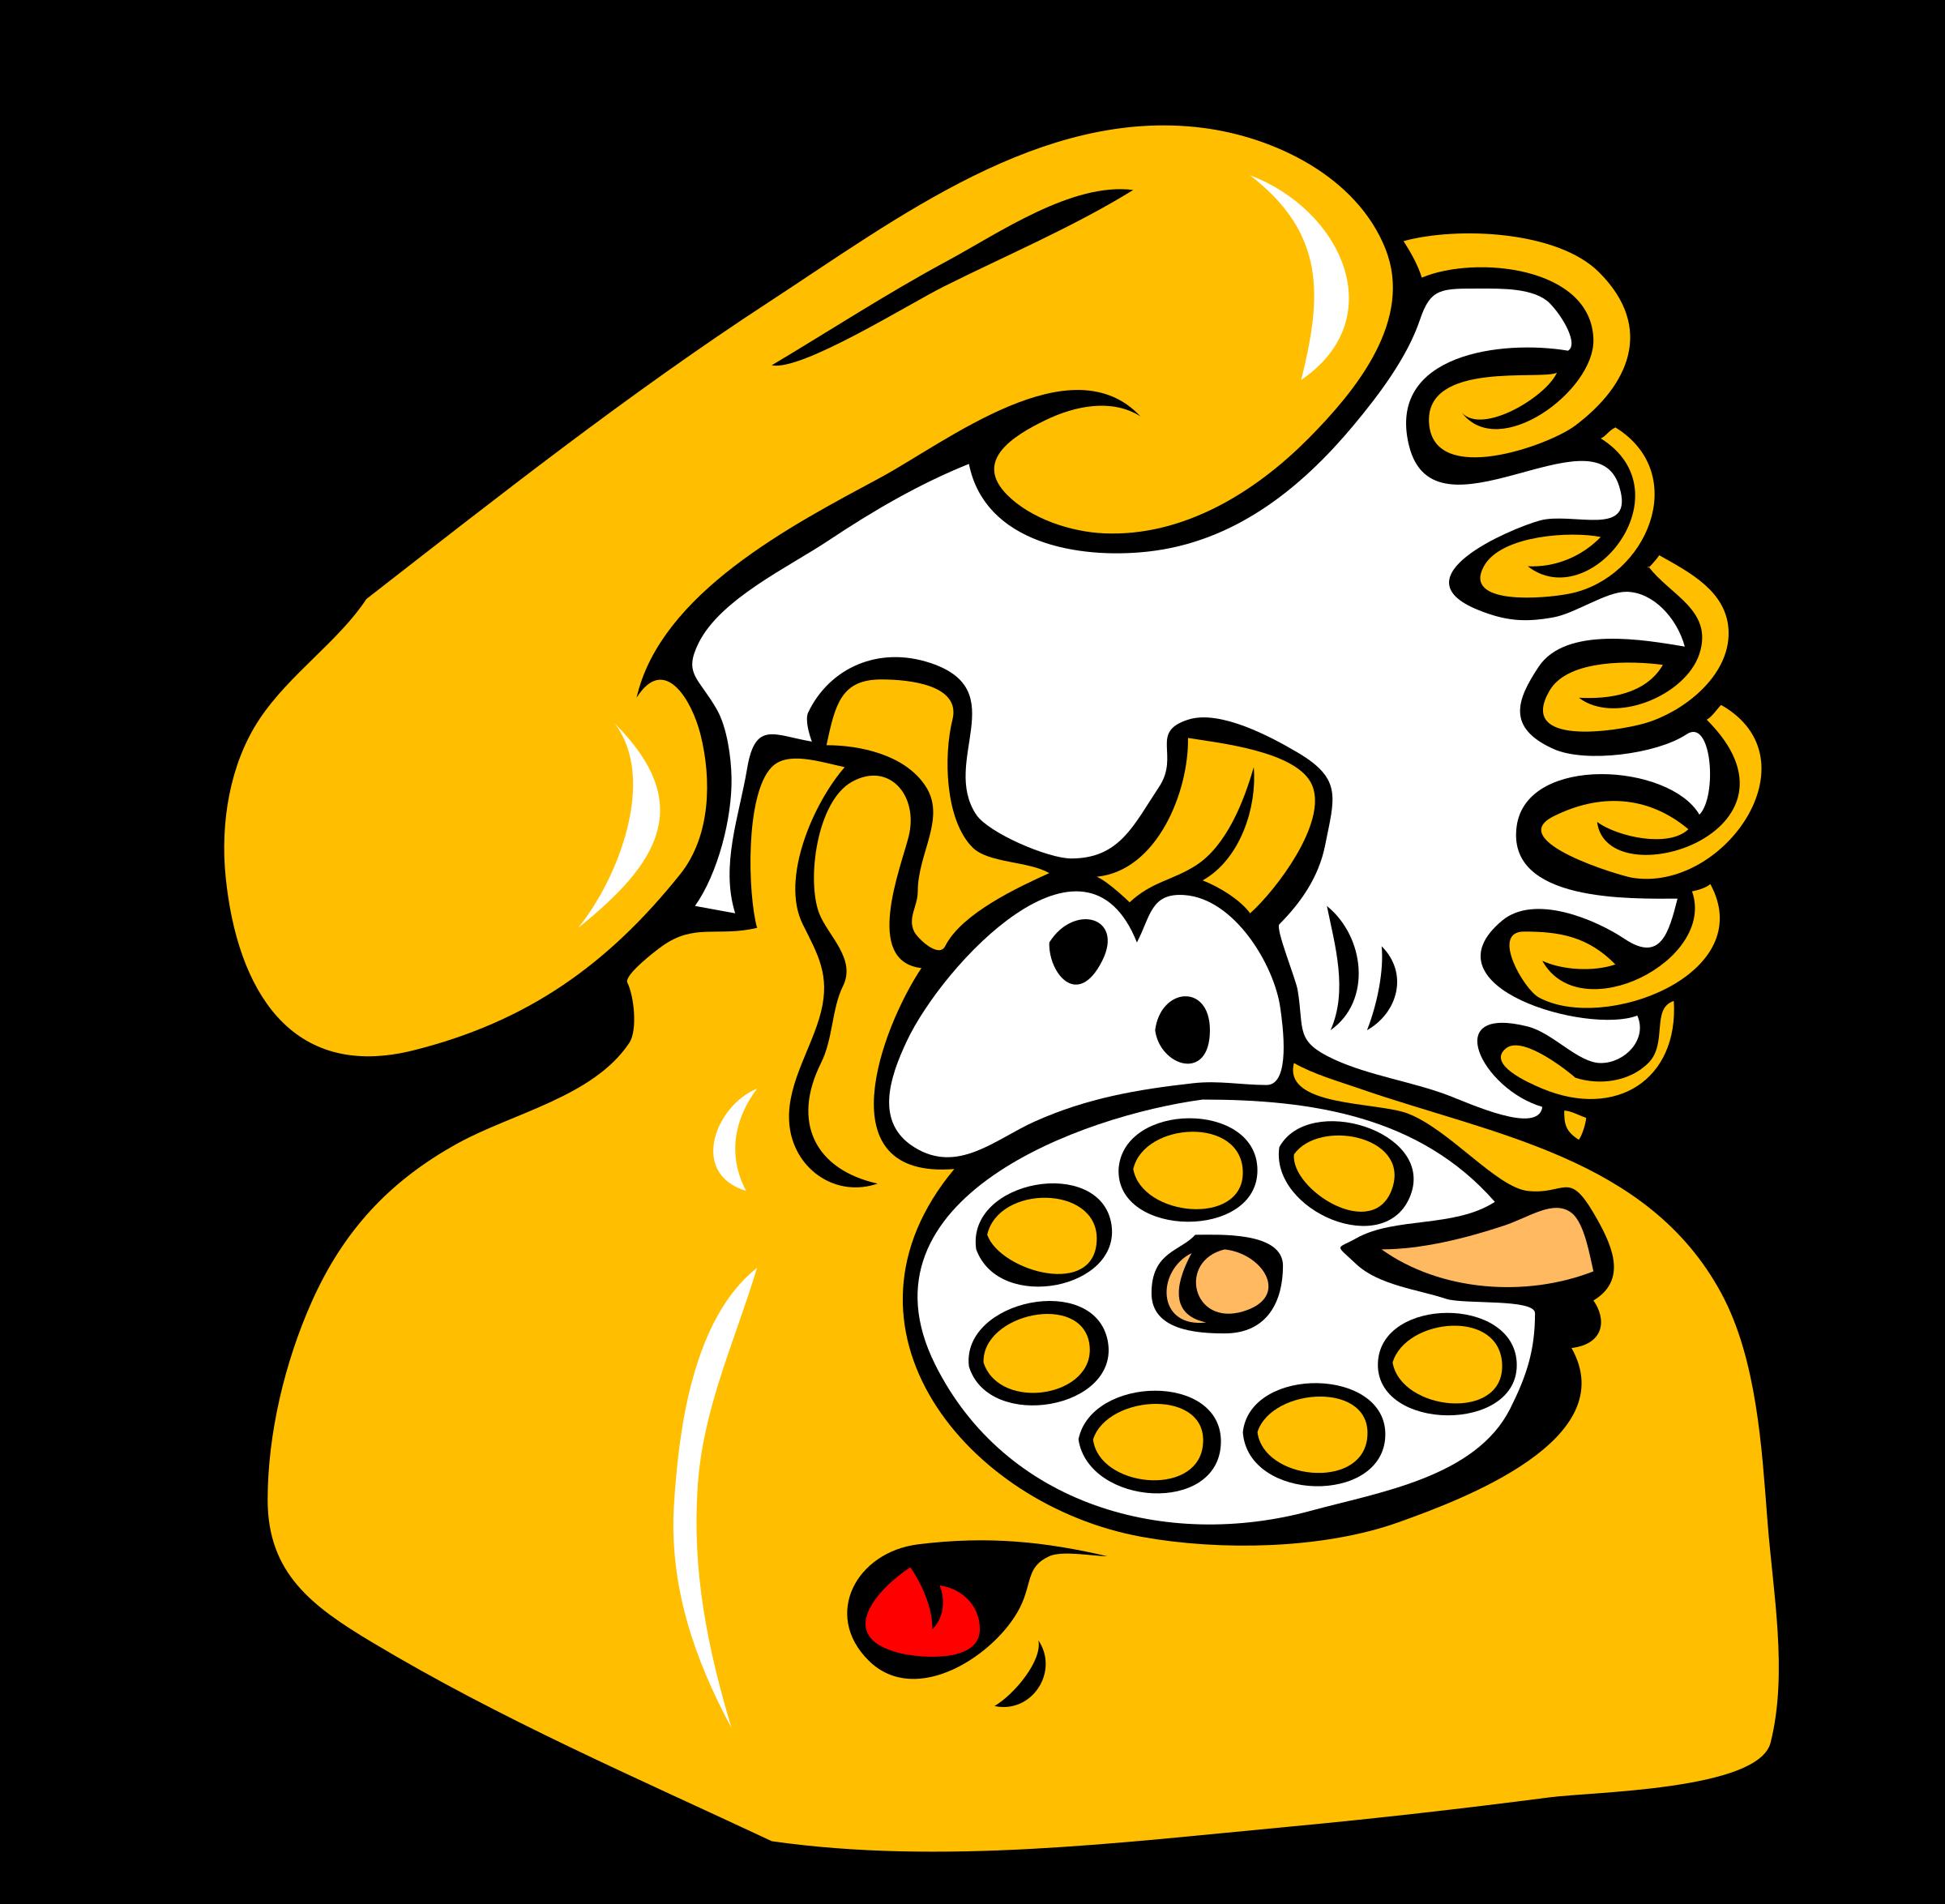 Telefono clipart 4 » Clipart Station.